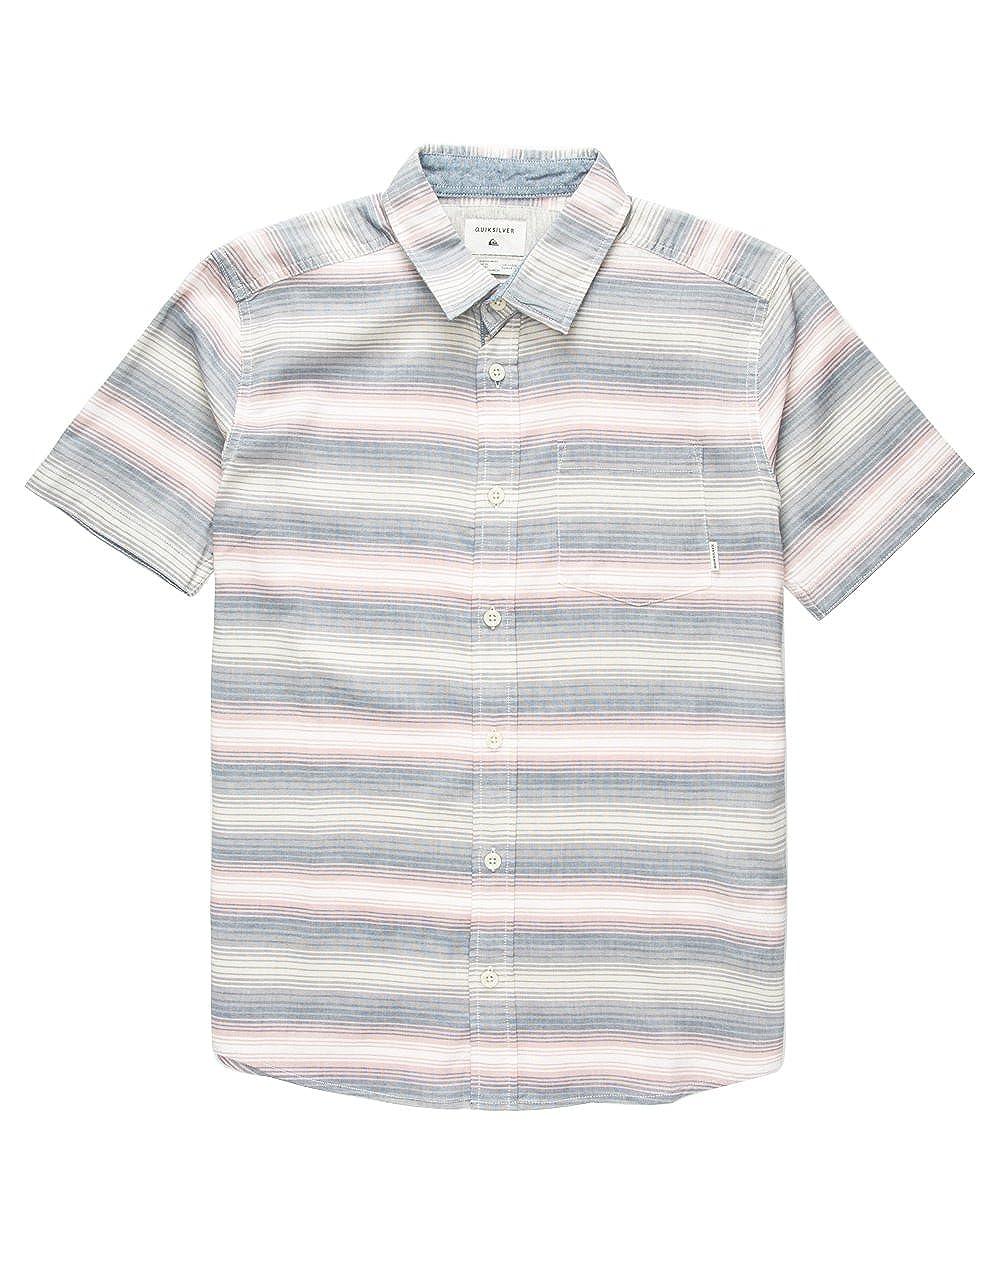 Quiksilver Big Boys Burnin Long Sleeve Shirt